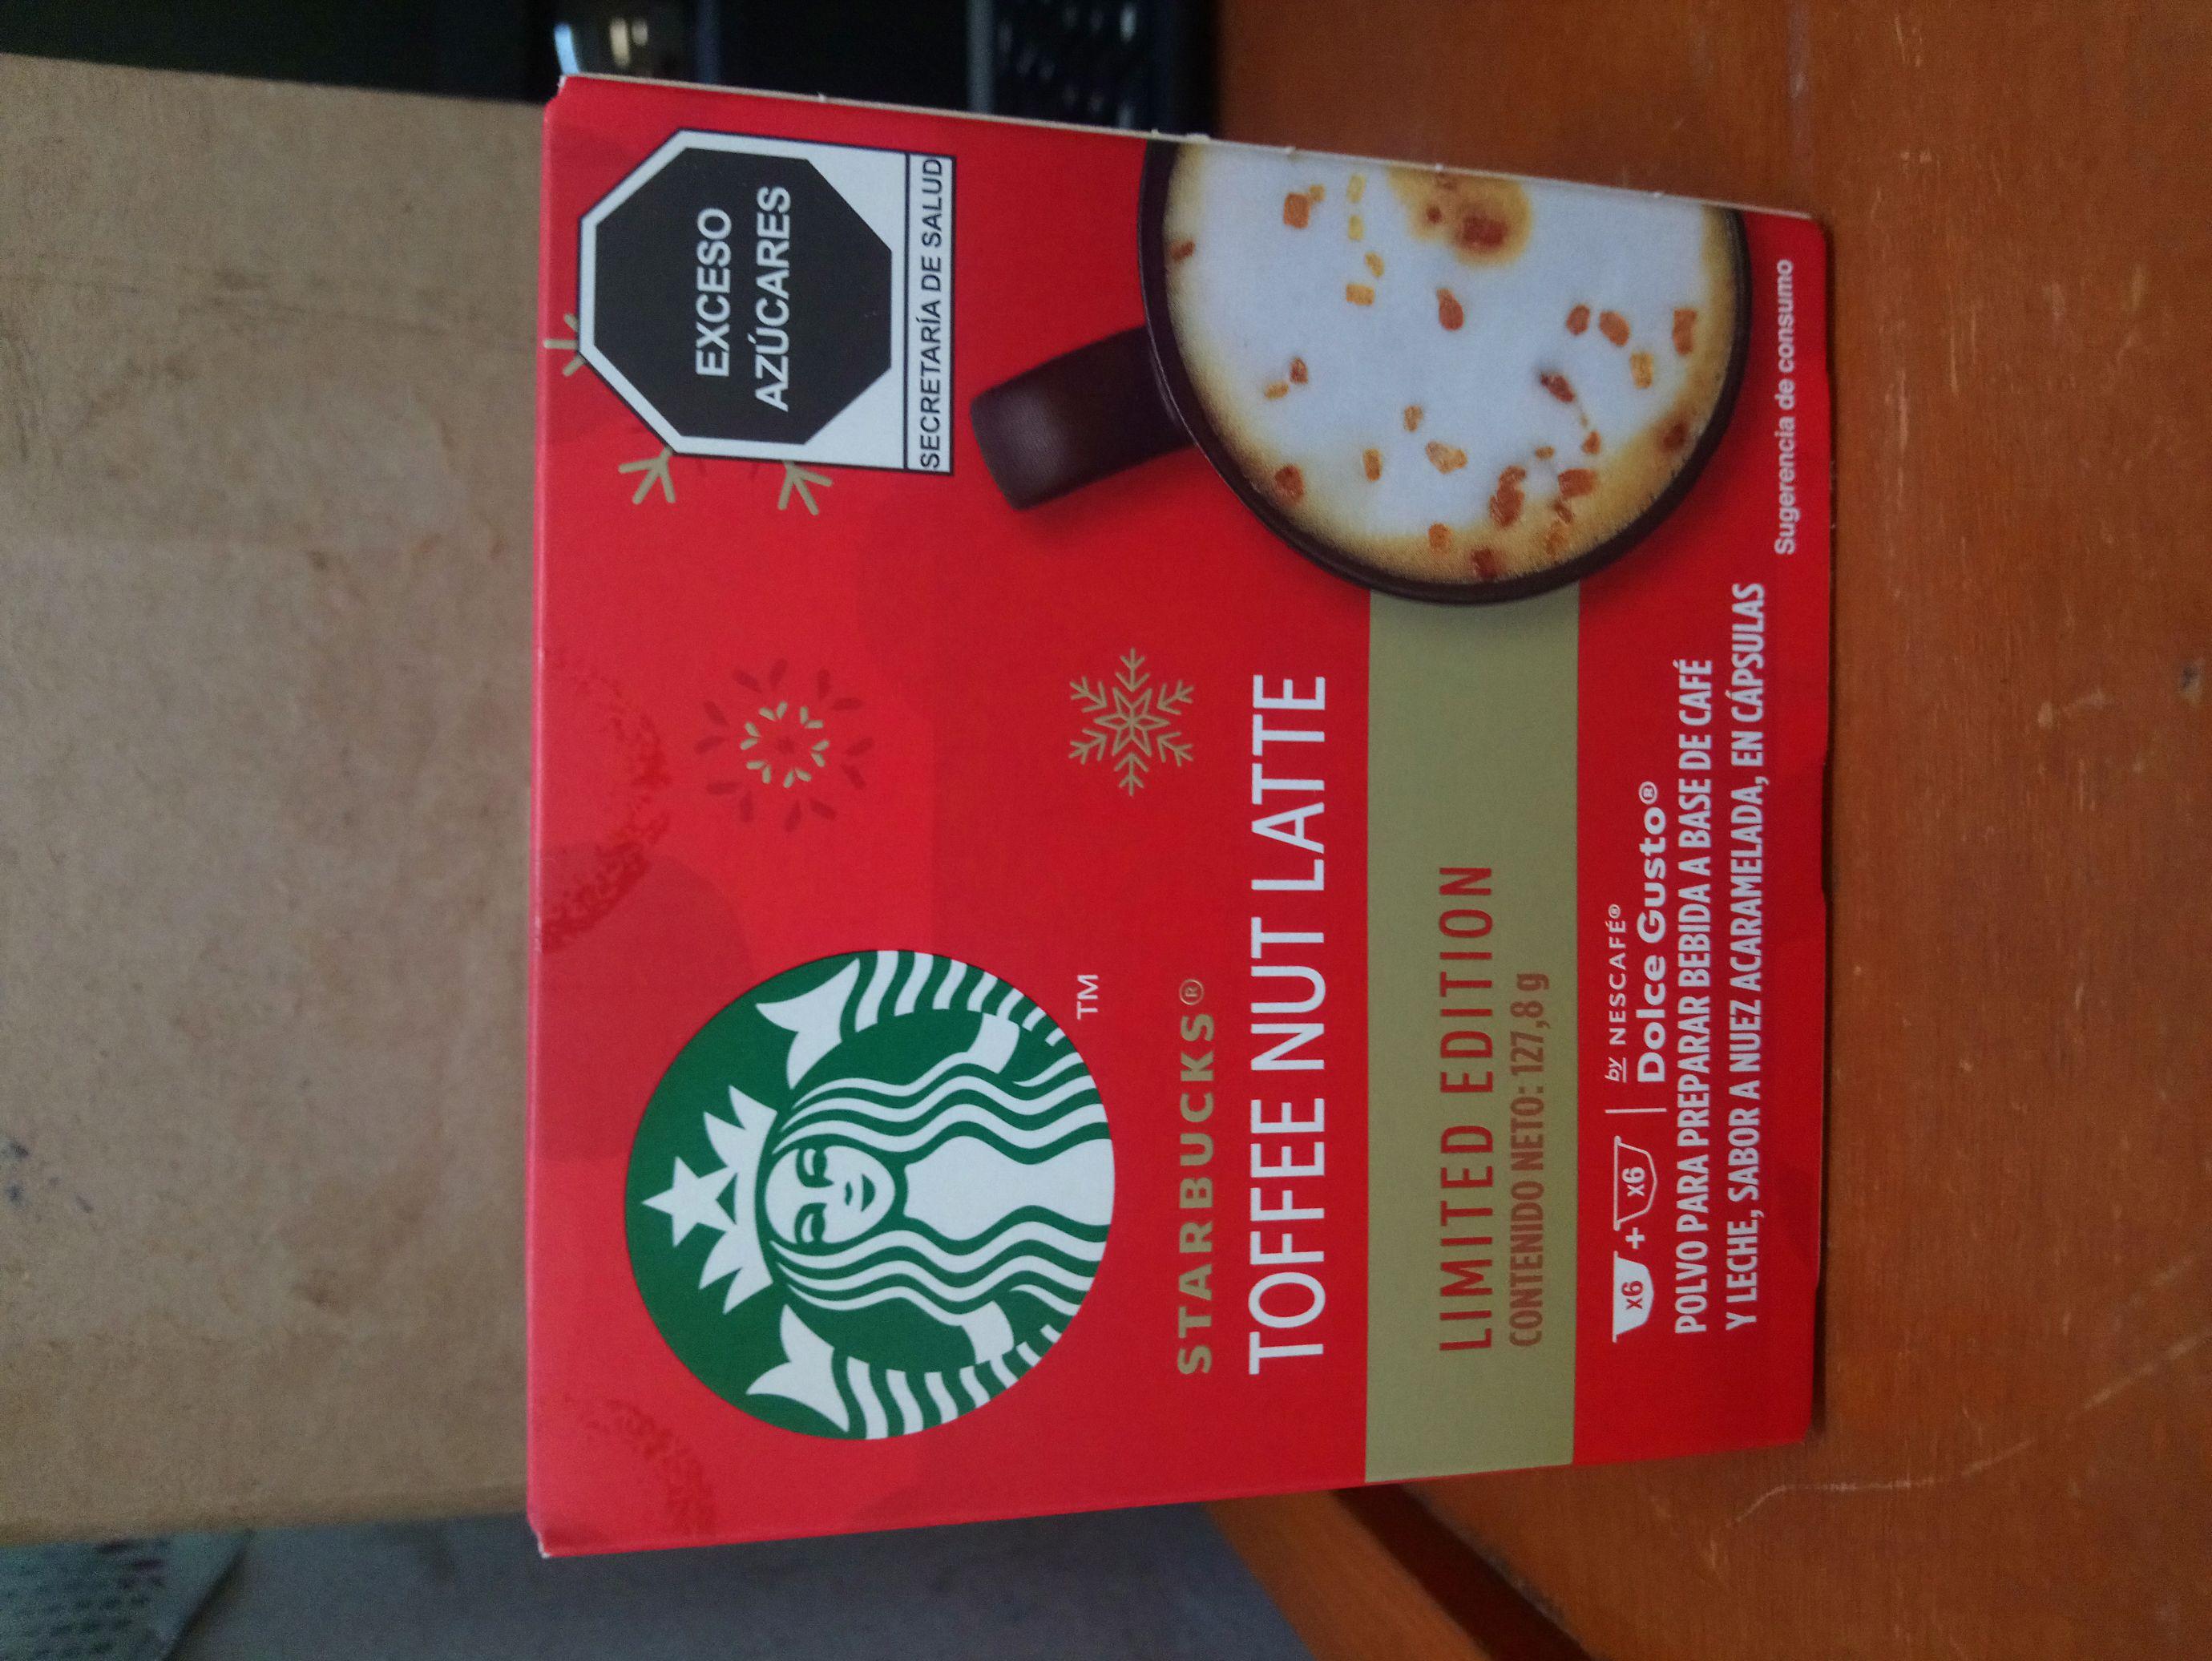 Walmart: $33.01 Cápsulas Dolce Gusto Starbucks Tofee Nut Latte